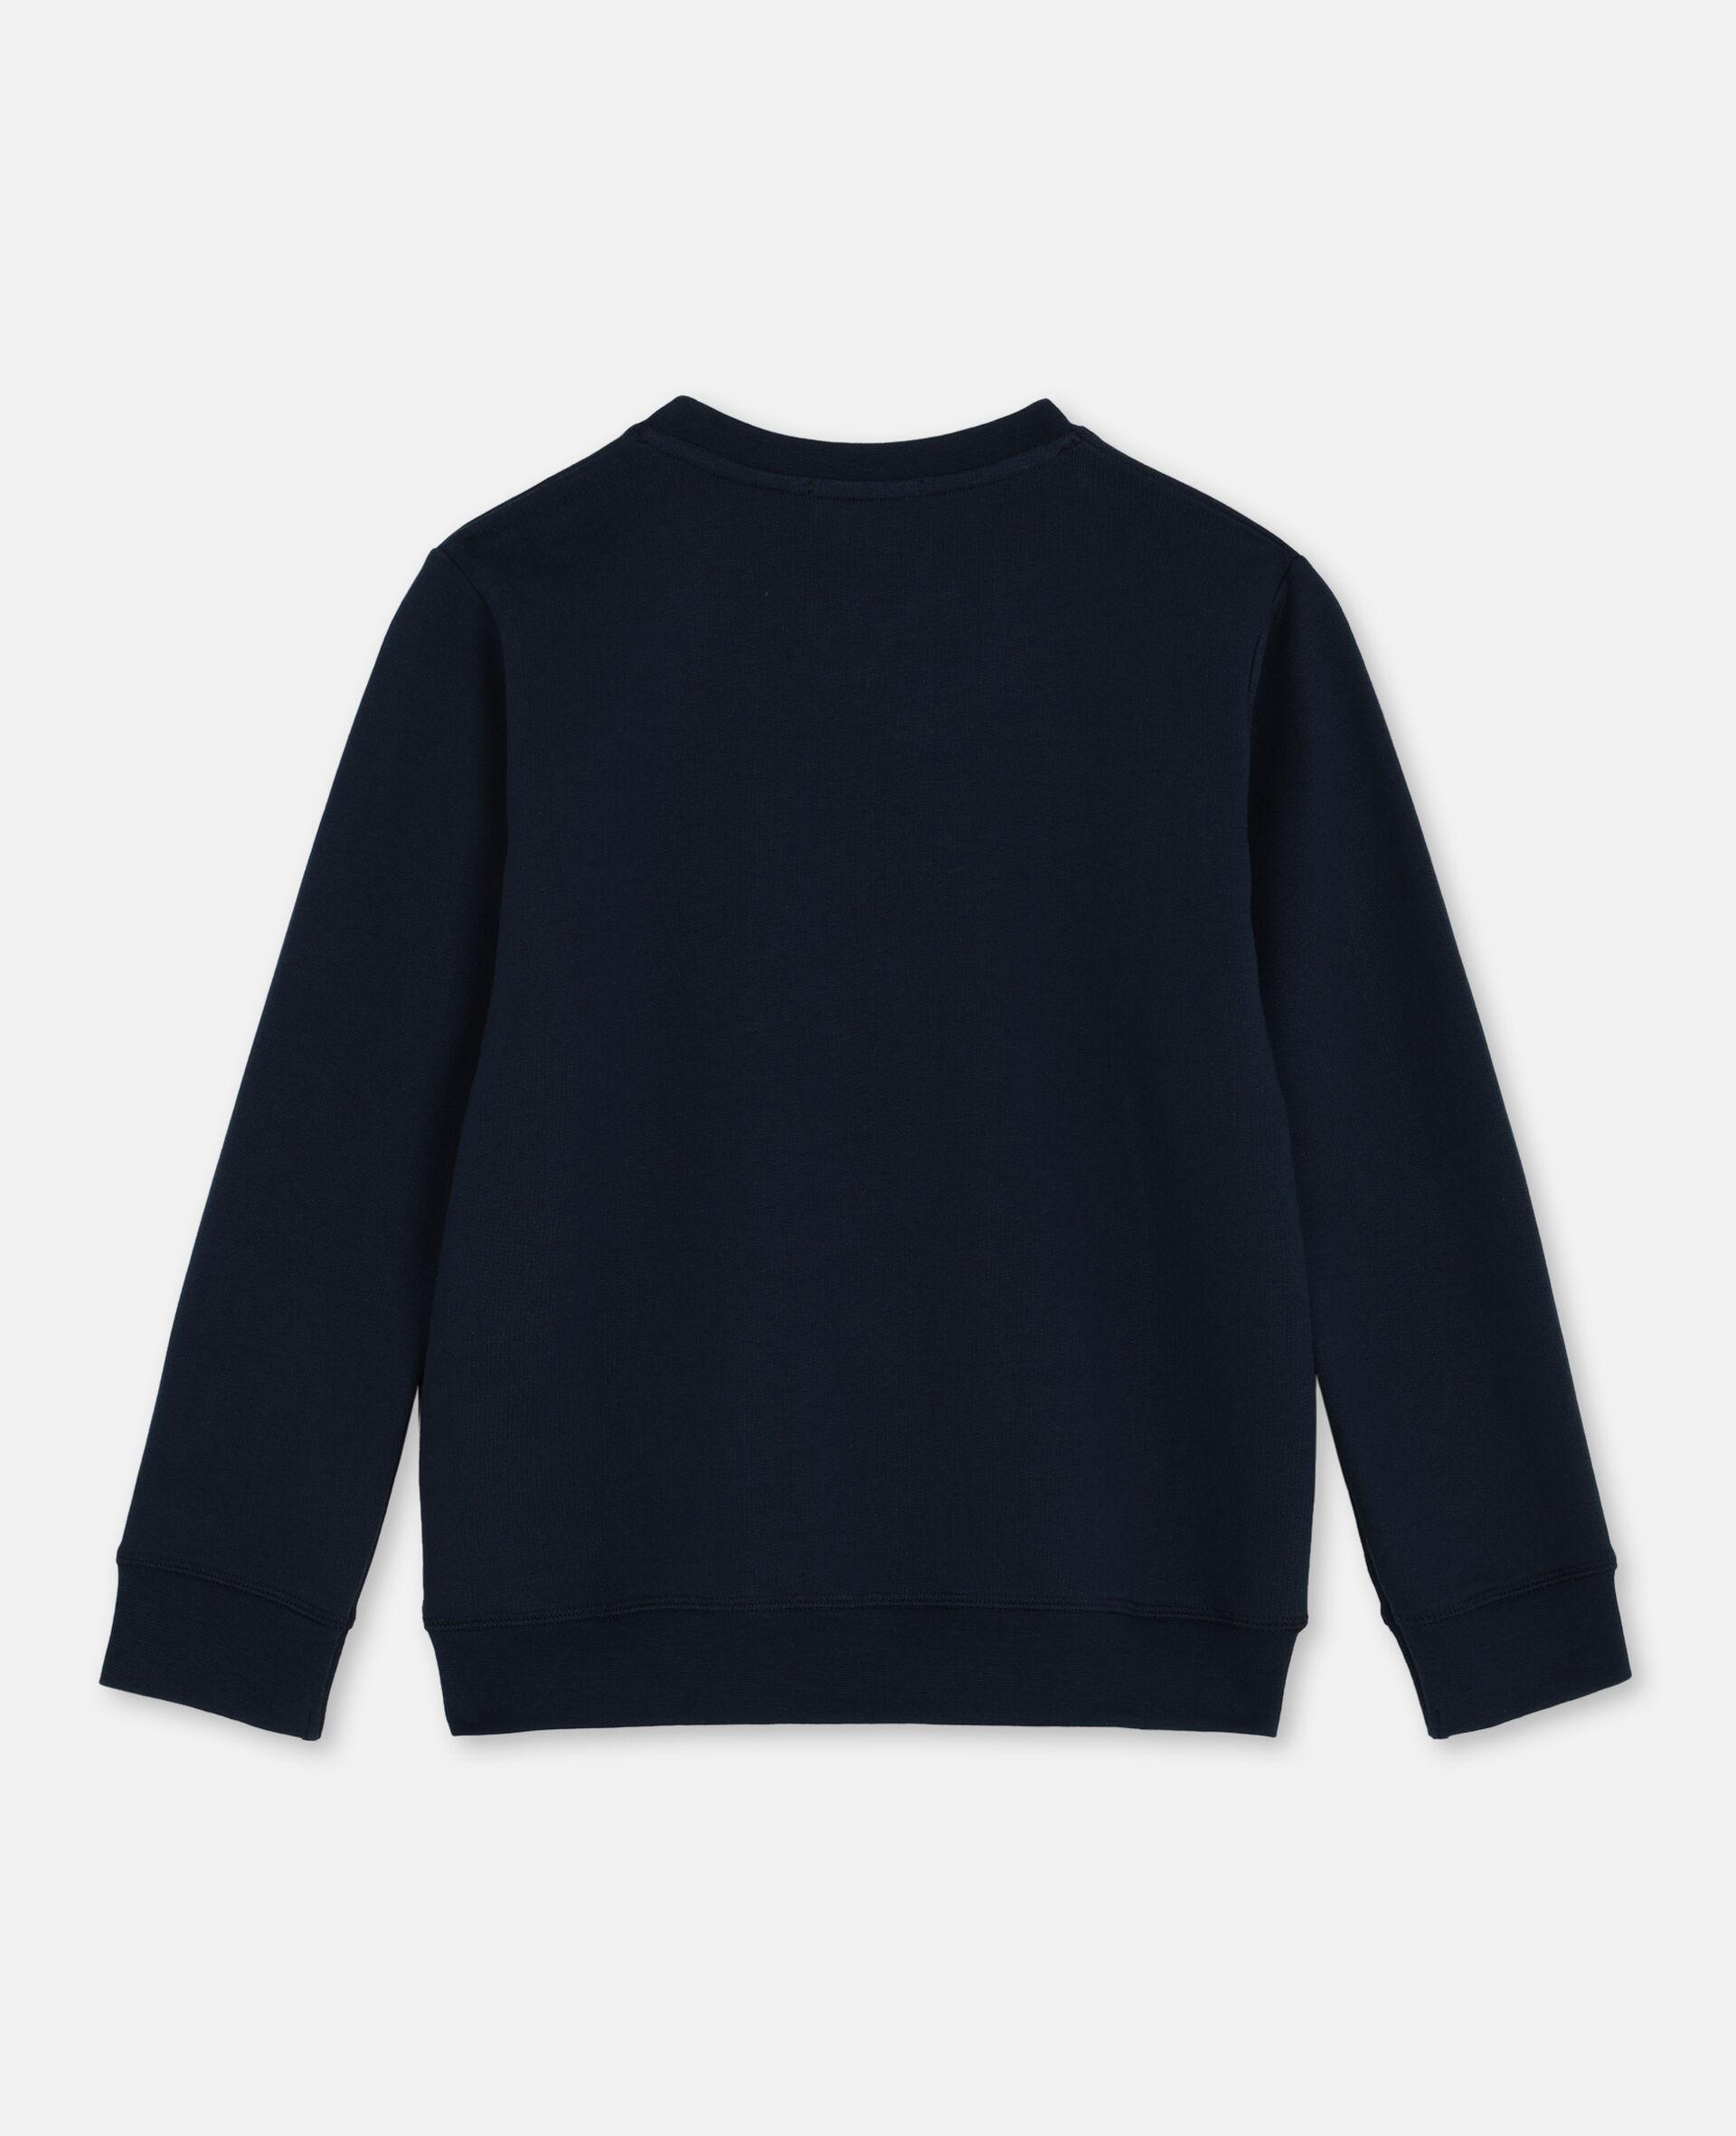 Oversized-Sweathshirt aus Baumwollfleece mit Logo-Blau-large image number 3